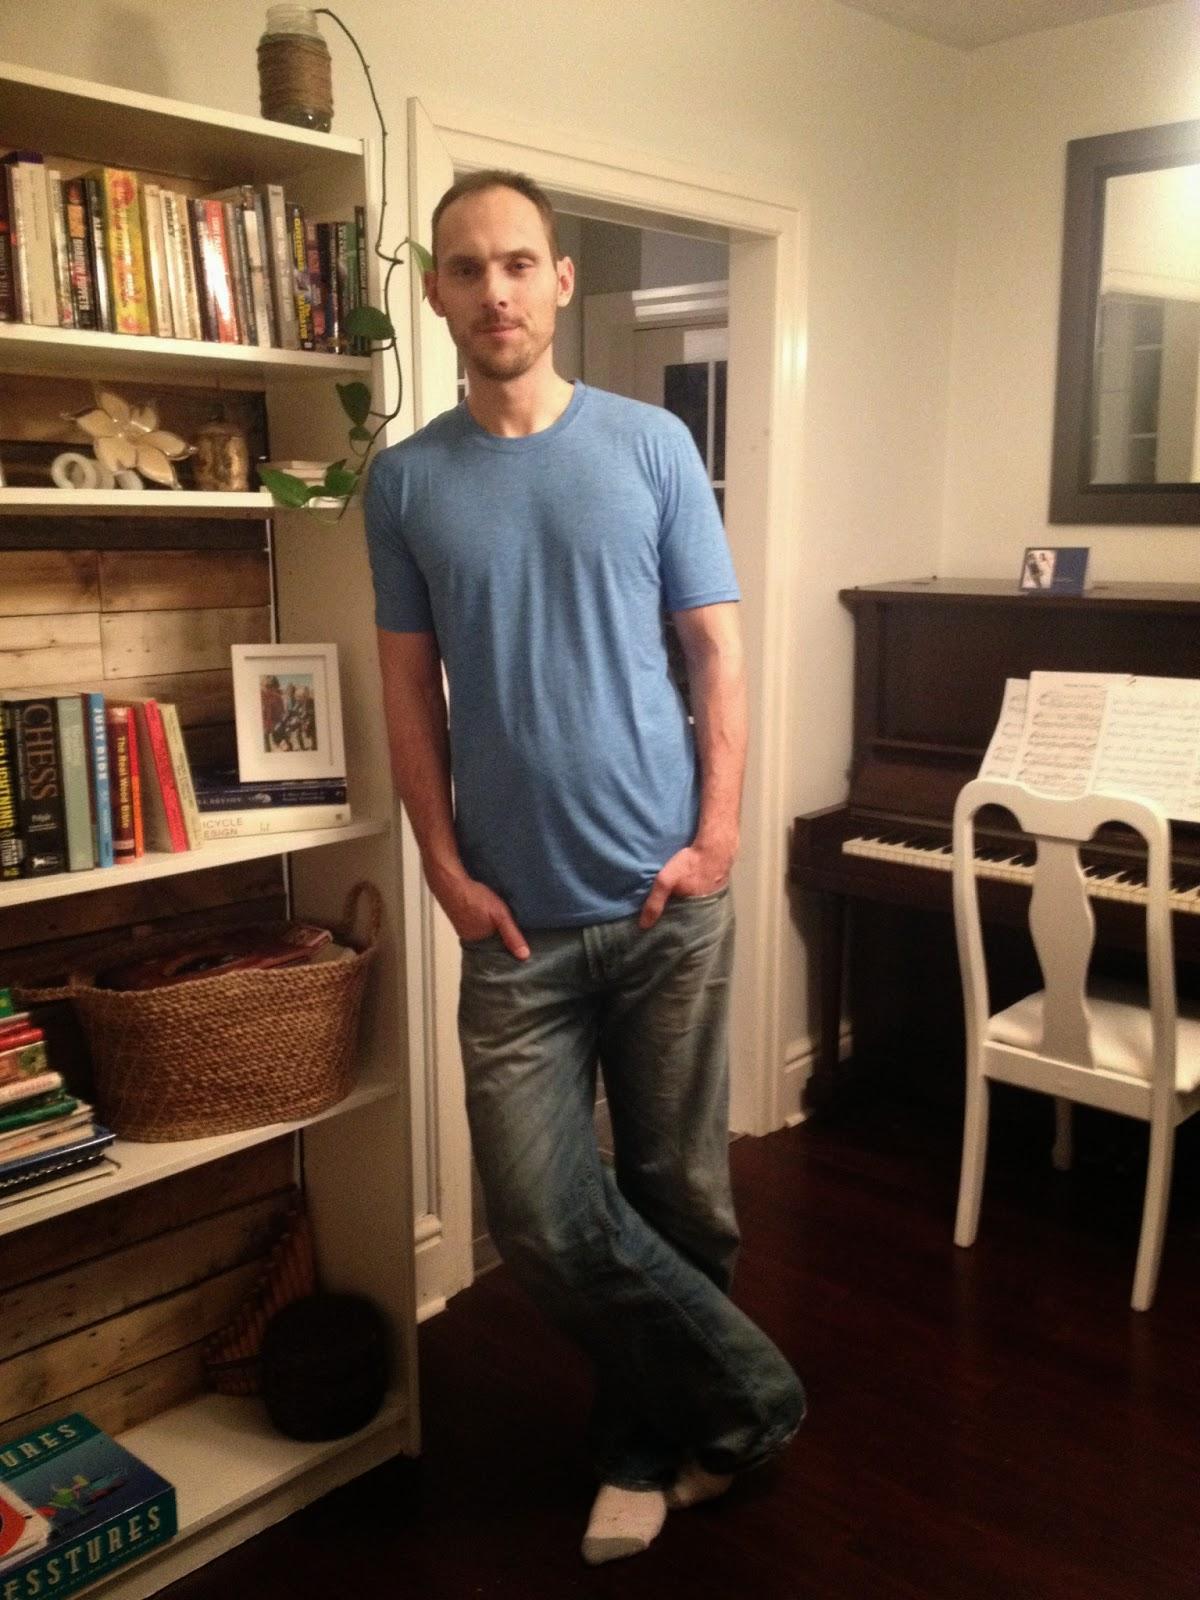 Medium Tal T-shirt for Tall Skinny Guy